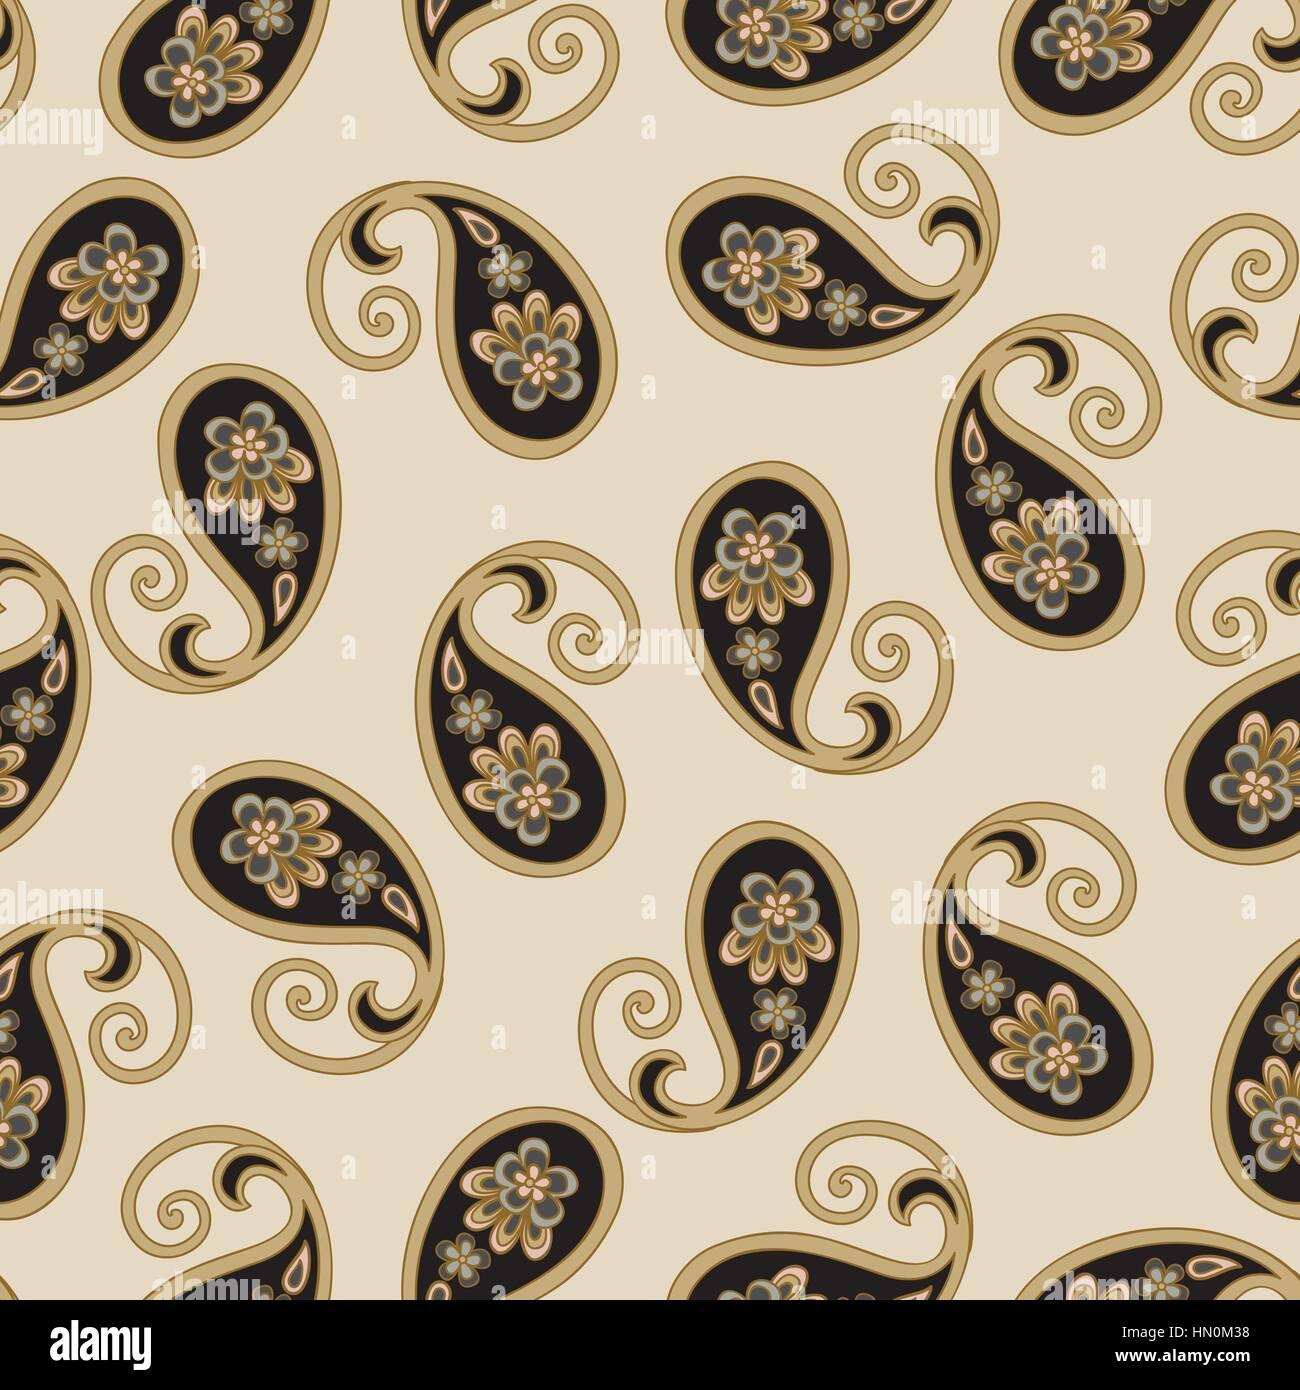 Trama perfecta floral. árabe ornamento de flores ornamentales florecen la textura de fondo. Imagen De Stock